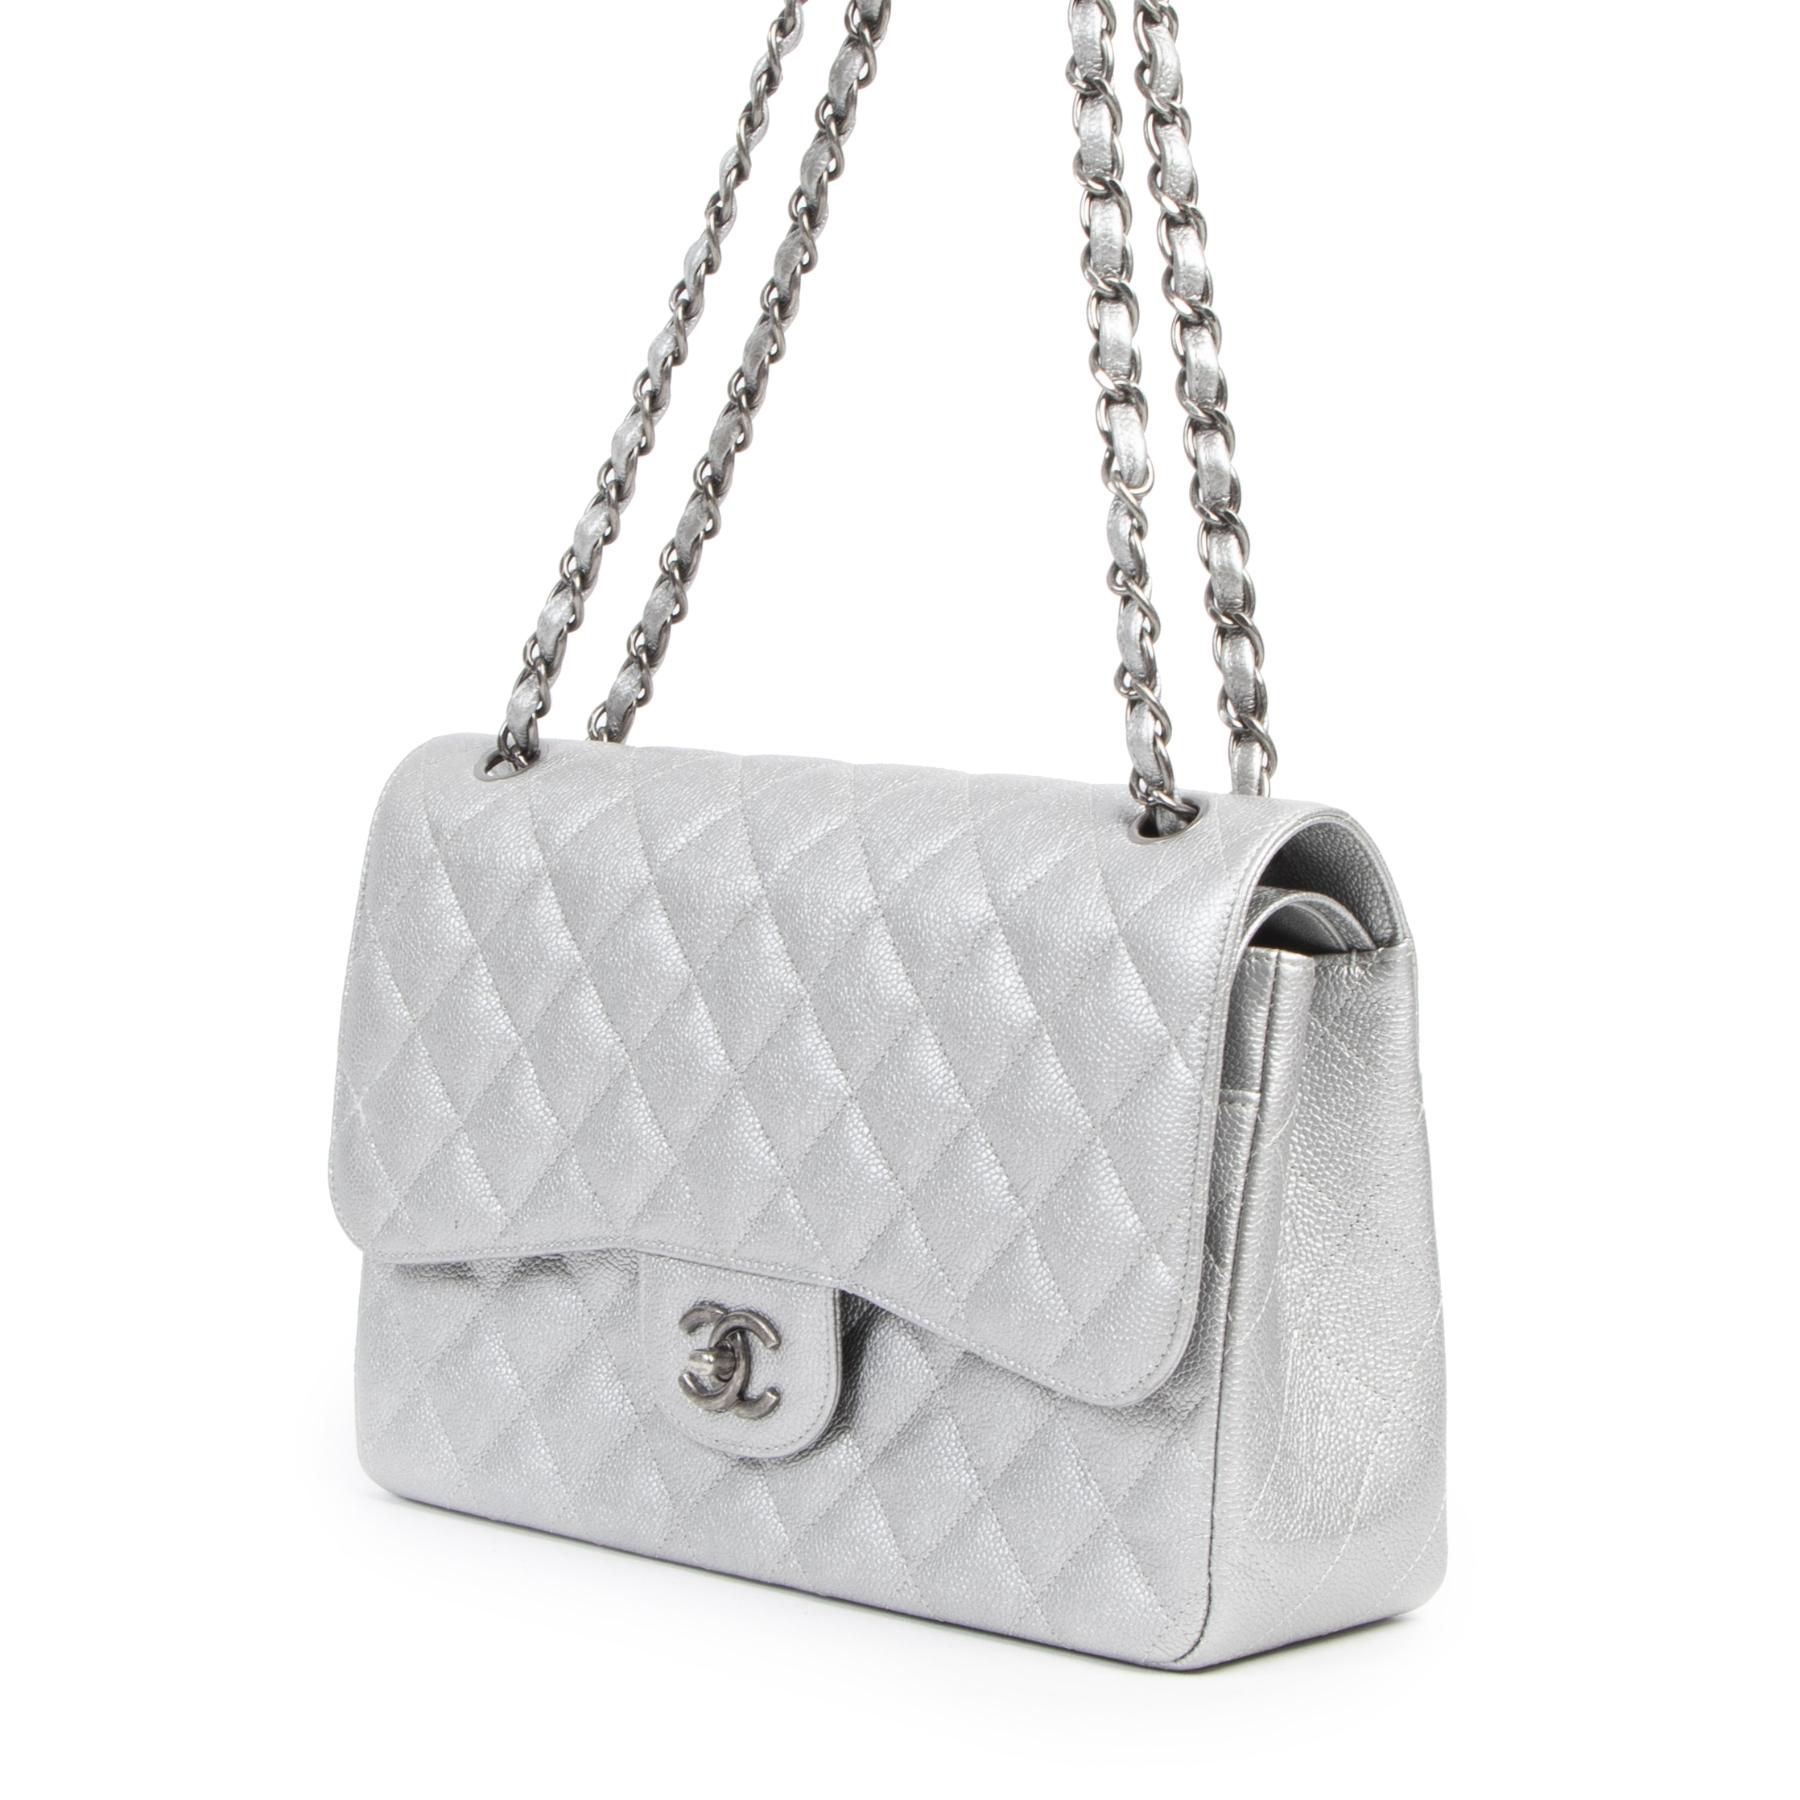 Chanel Silver Jumbo Classic Flap Bag